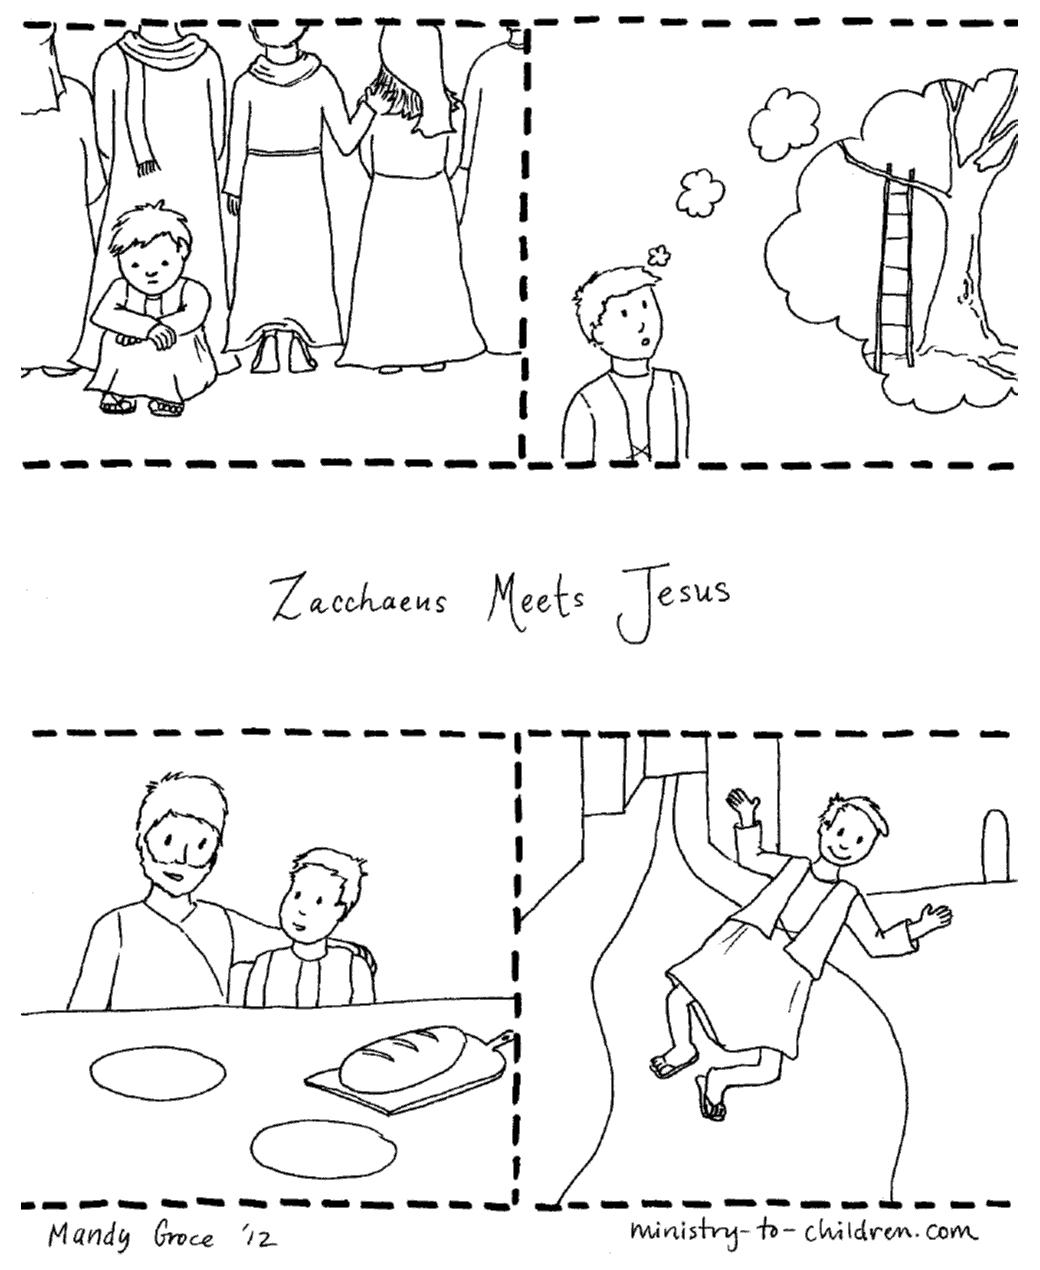 Zacchaeus Crafts for Sunday School (Luke 19:1-10) Craft